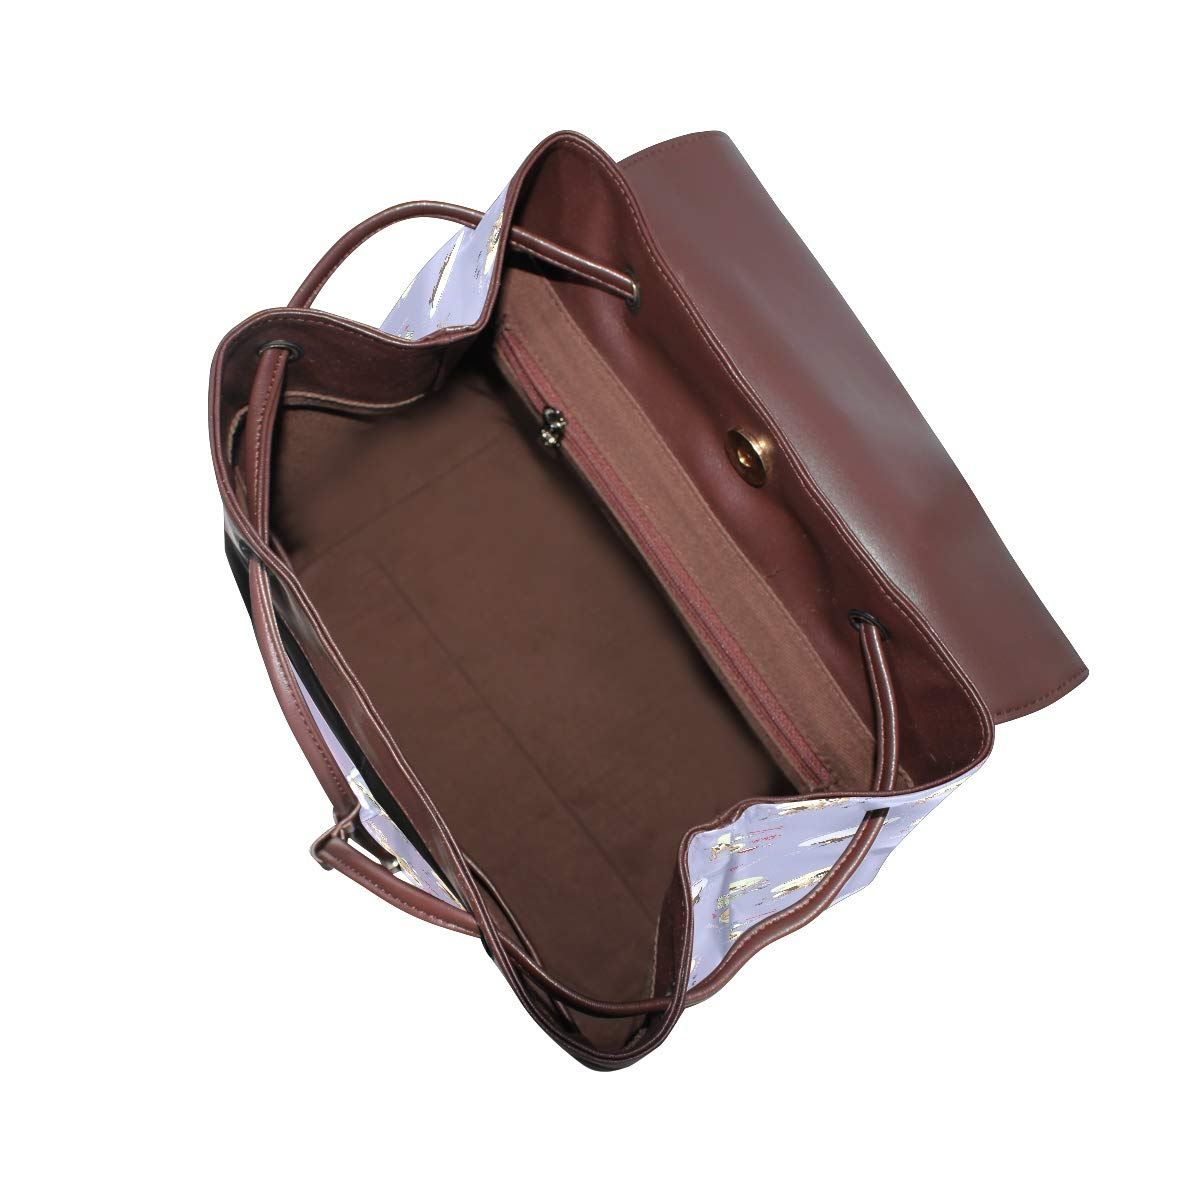 Leather Dog Sleeping Backpack Daypack Bag Women